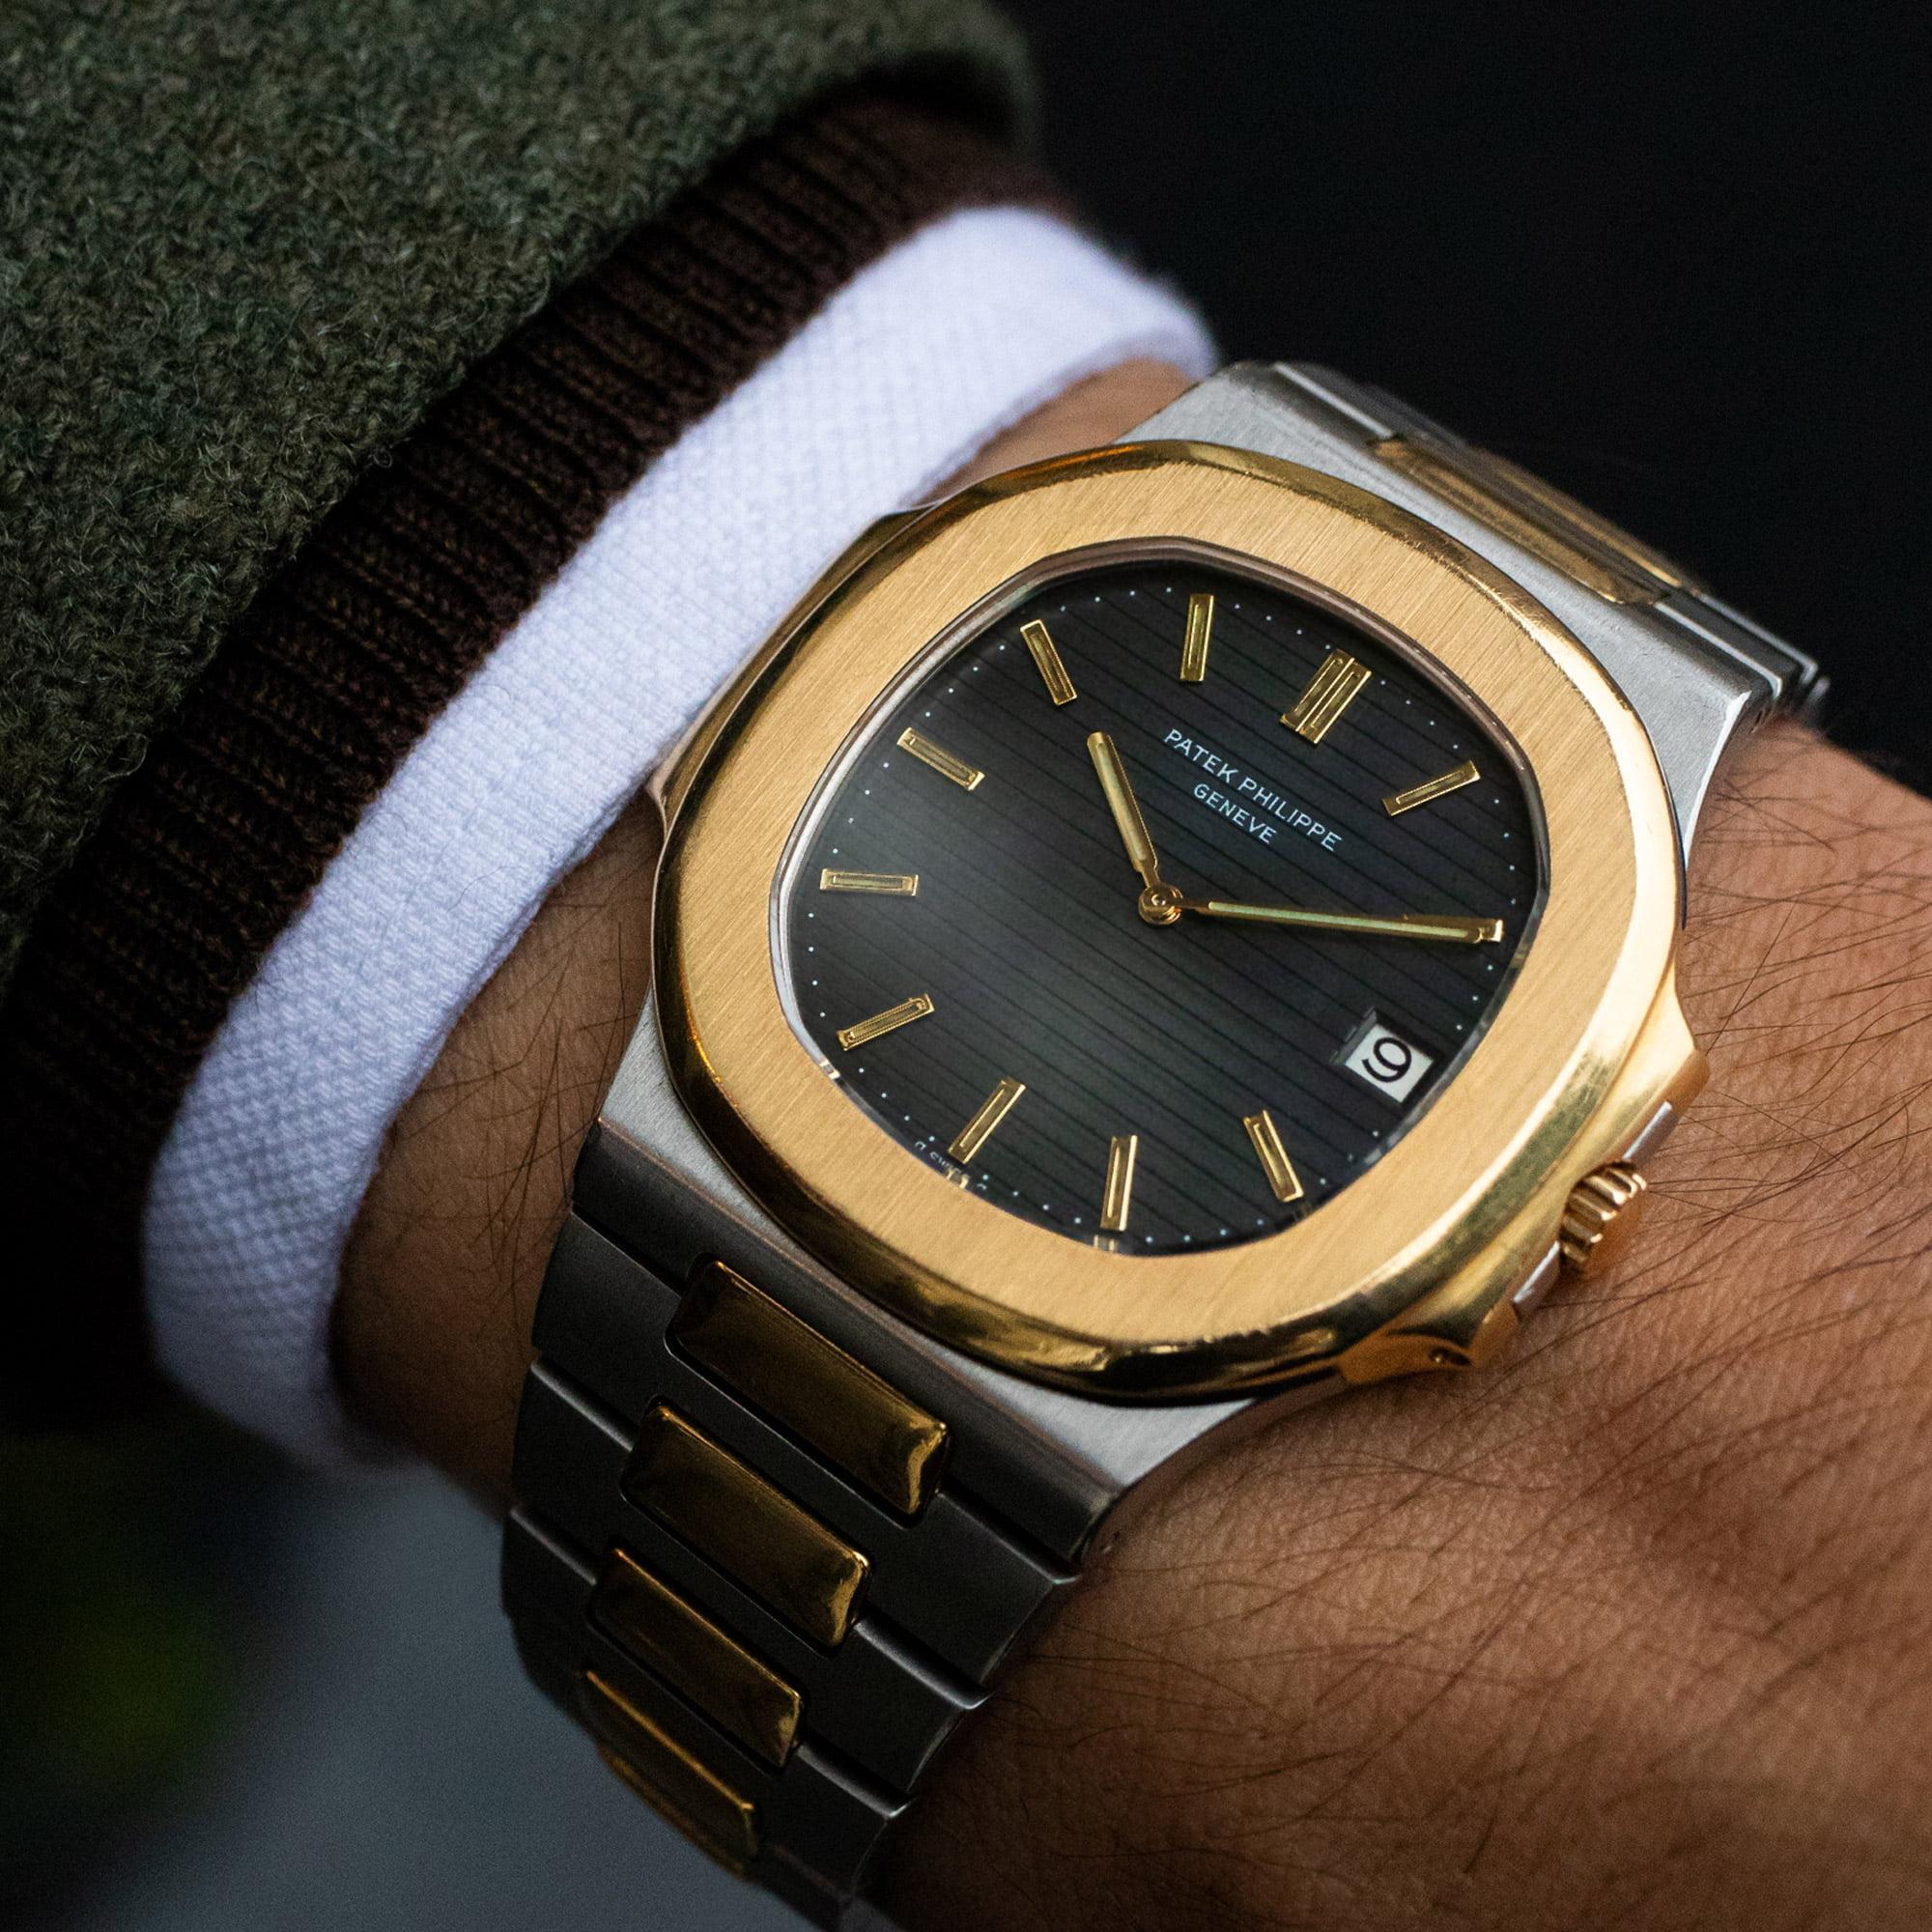 Patek philippe nautilus 3700 11 amsterdam vintage watches for Patek philippe nautilus